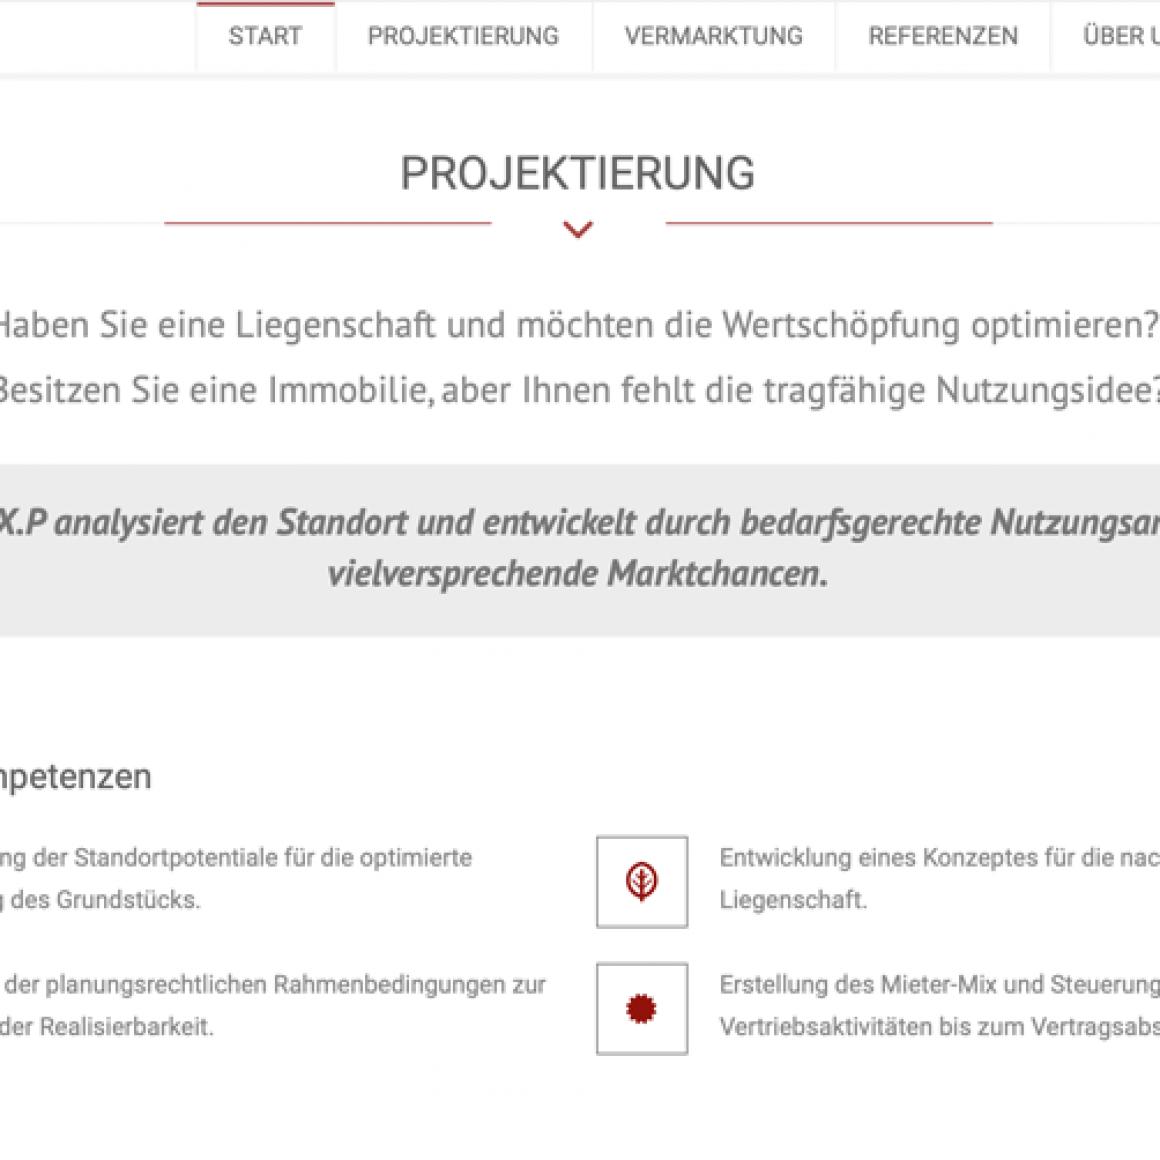 MP_Referenz_01-1160x1160 MAX.P GmbH